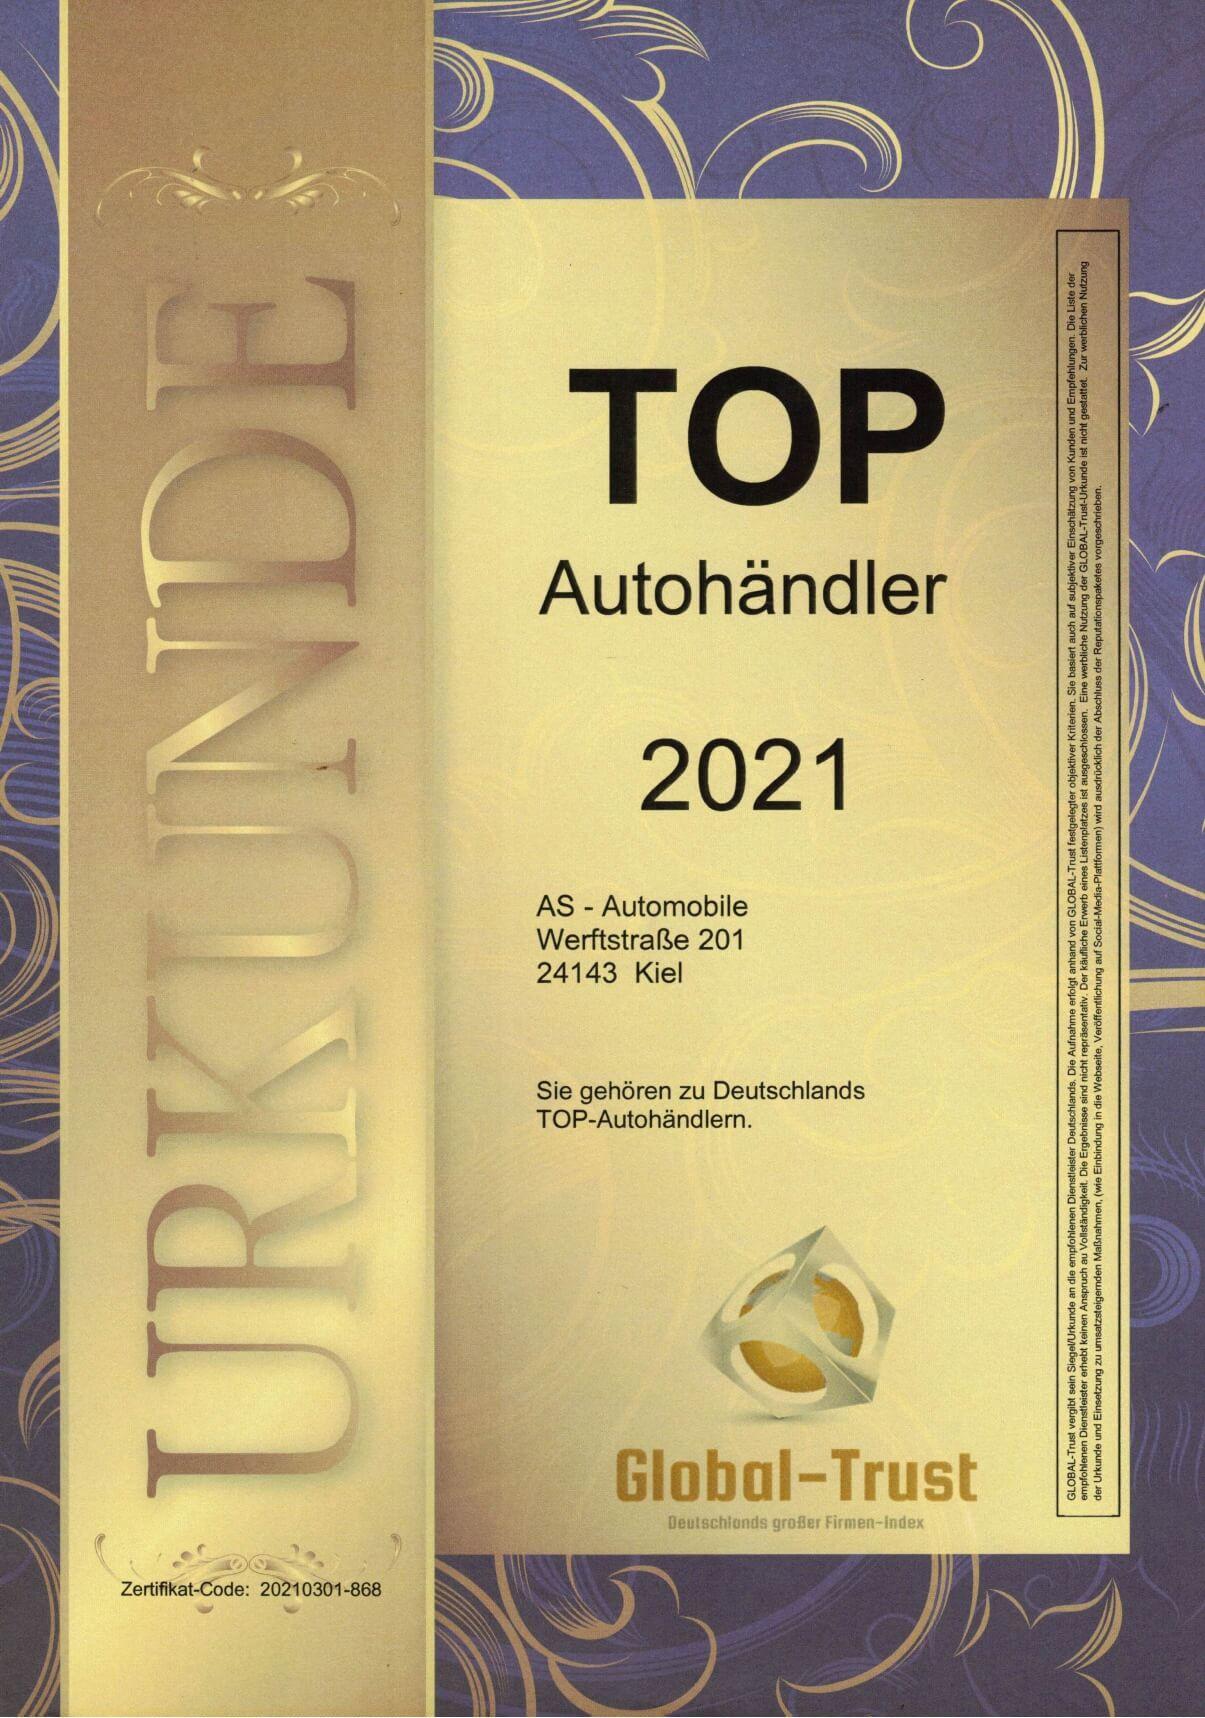 Top Händler AS Automobile